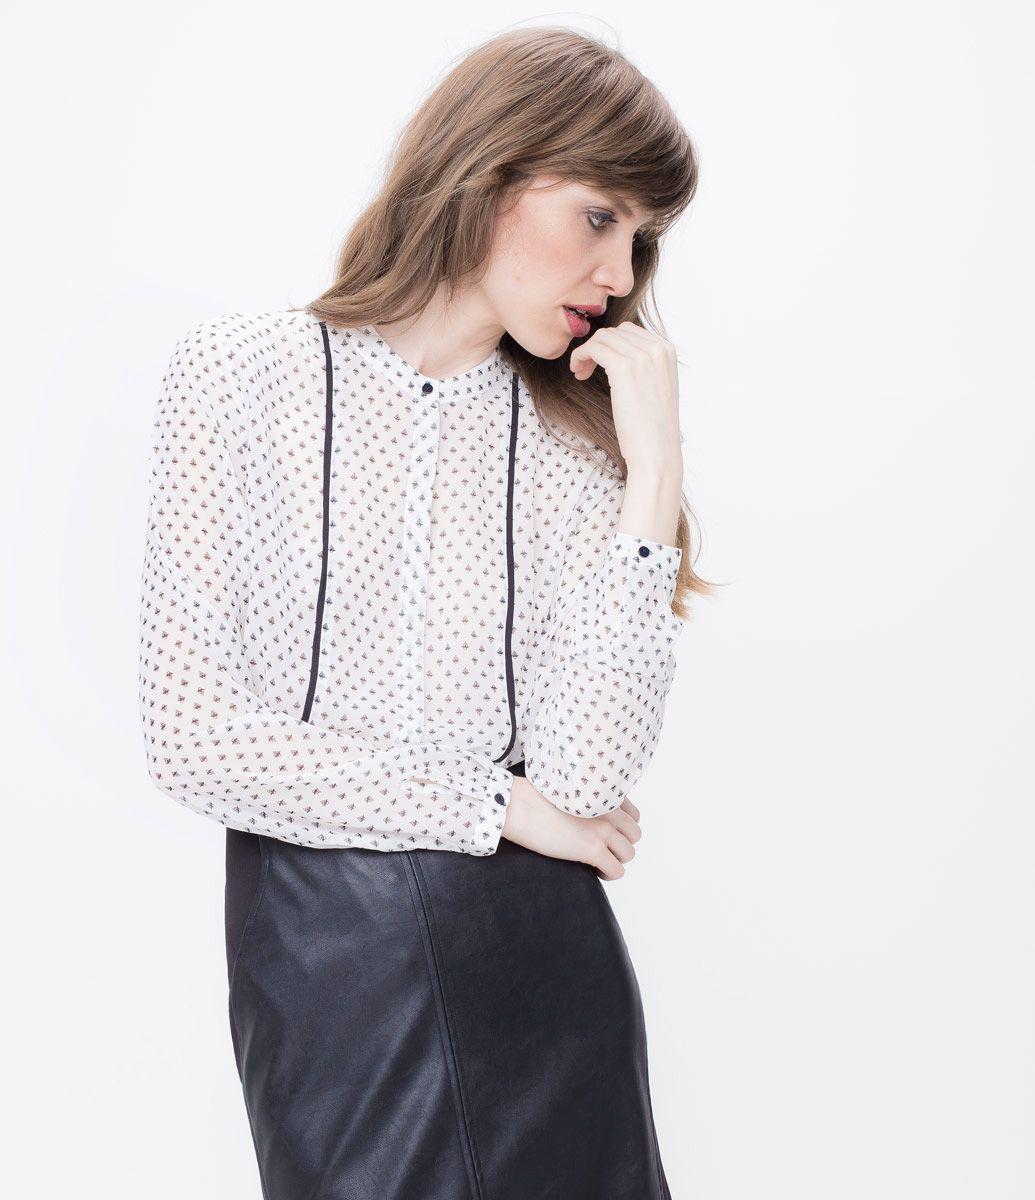 2f56c61be Blusa feminina modelo camisa manga longa estampada